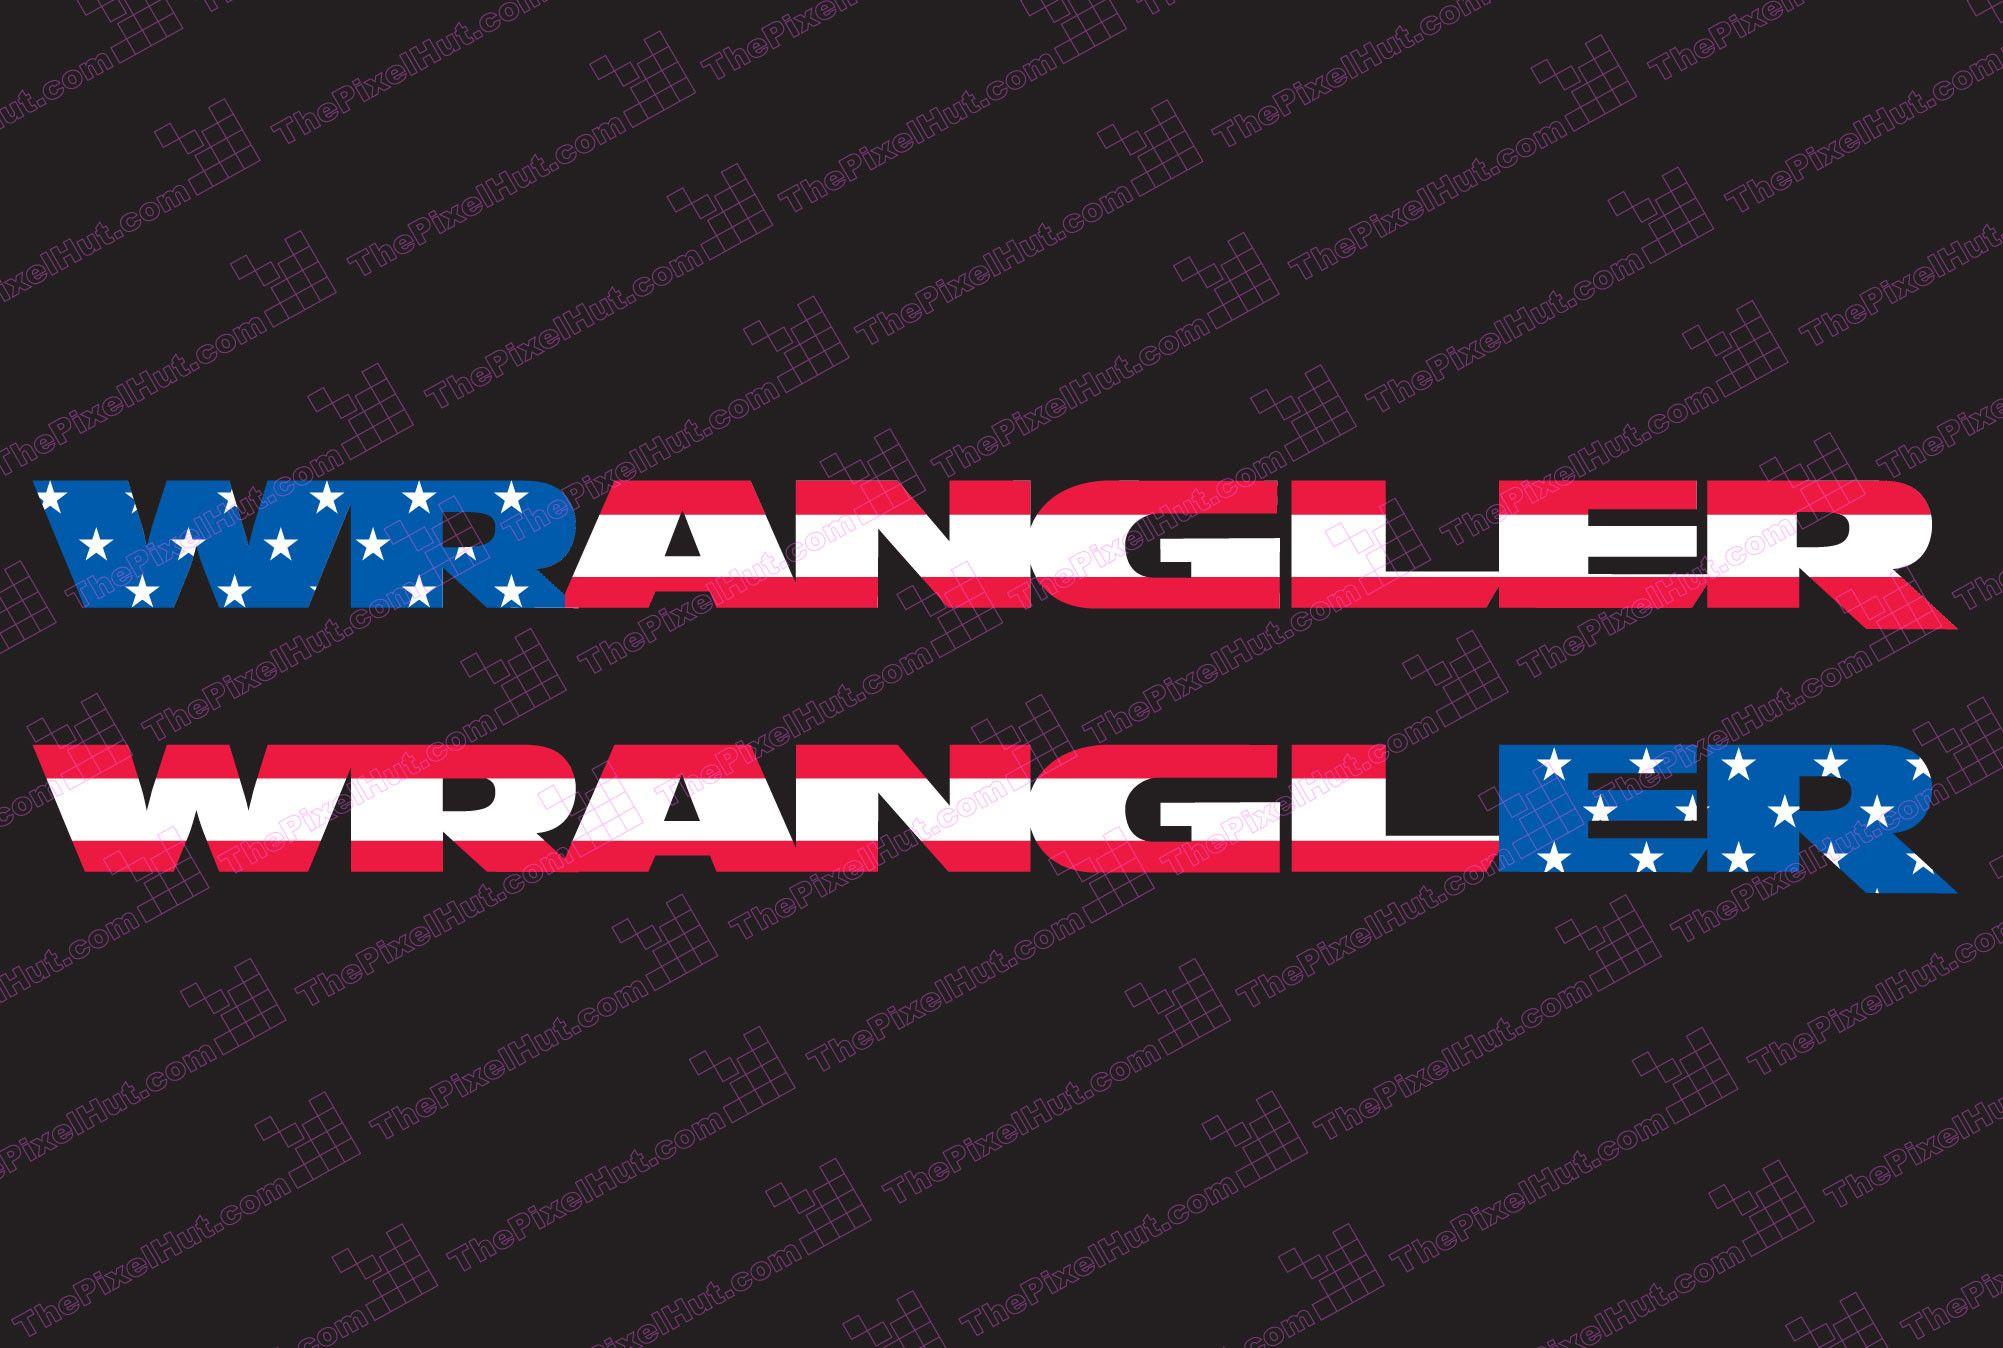 Jeep Wrangler Usa Flag Hood Decals Jk Style With Images Jeep Decals Custom Jeep Jeep Wrangler Accessories Decals